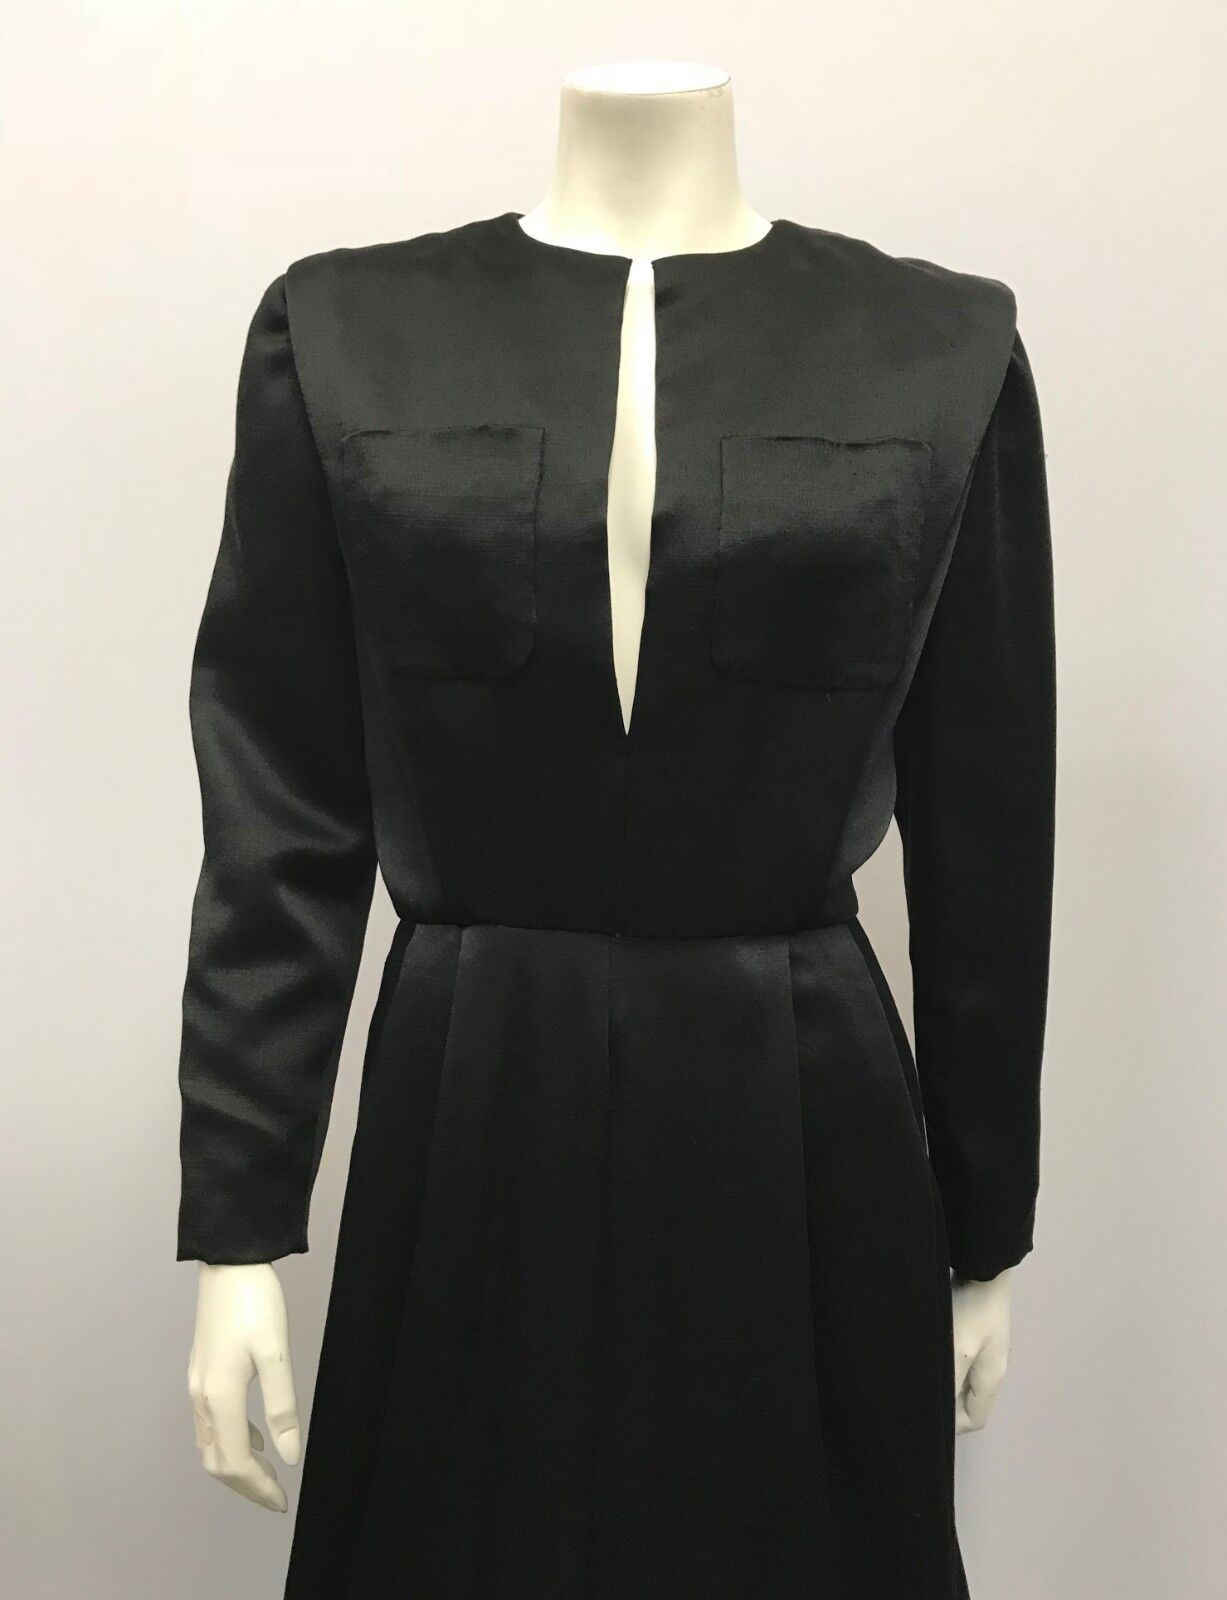 VINTAGE SCAASI BOUTIQUE DRESS COCKTAIL DRESS BLAC… - image 5